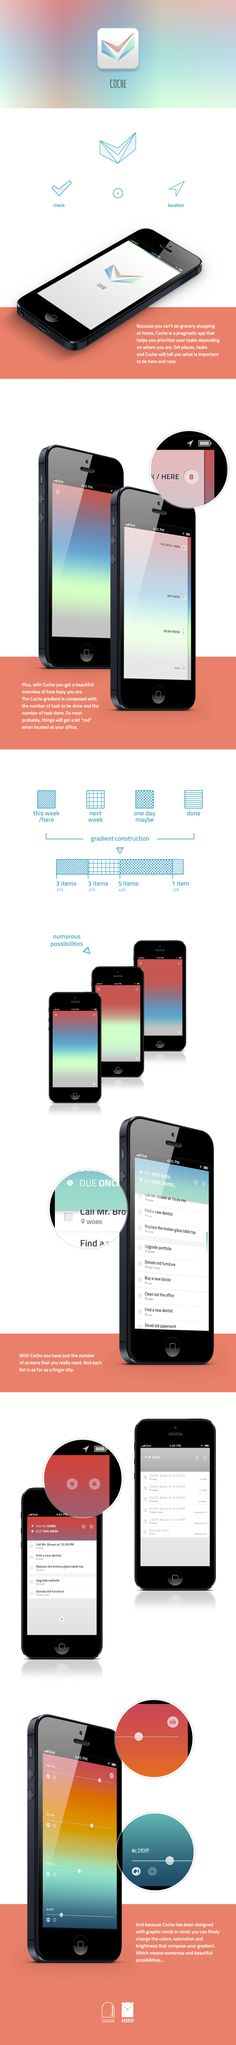 Latest User Interface Design Inspiration For Web & Mobile Mobile Ui Design, App Ui Design, User Interface Design, Web Mobile, Desktop Design, Application Web, Mobiles, App Design Inspiration, Applications